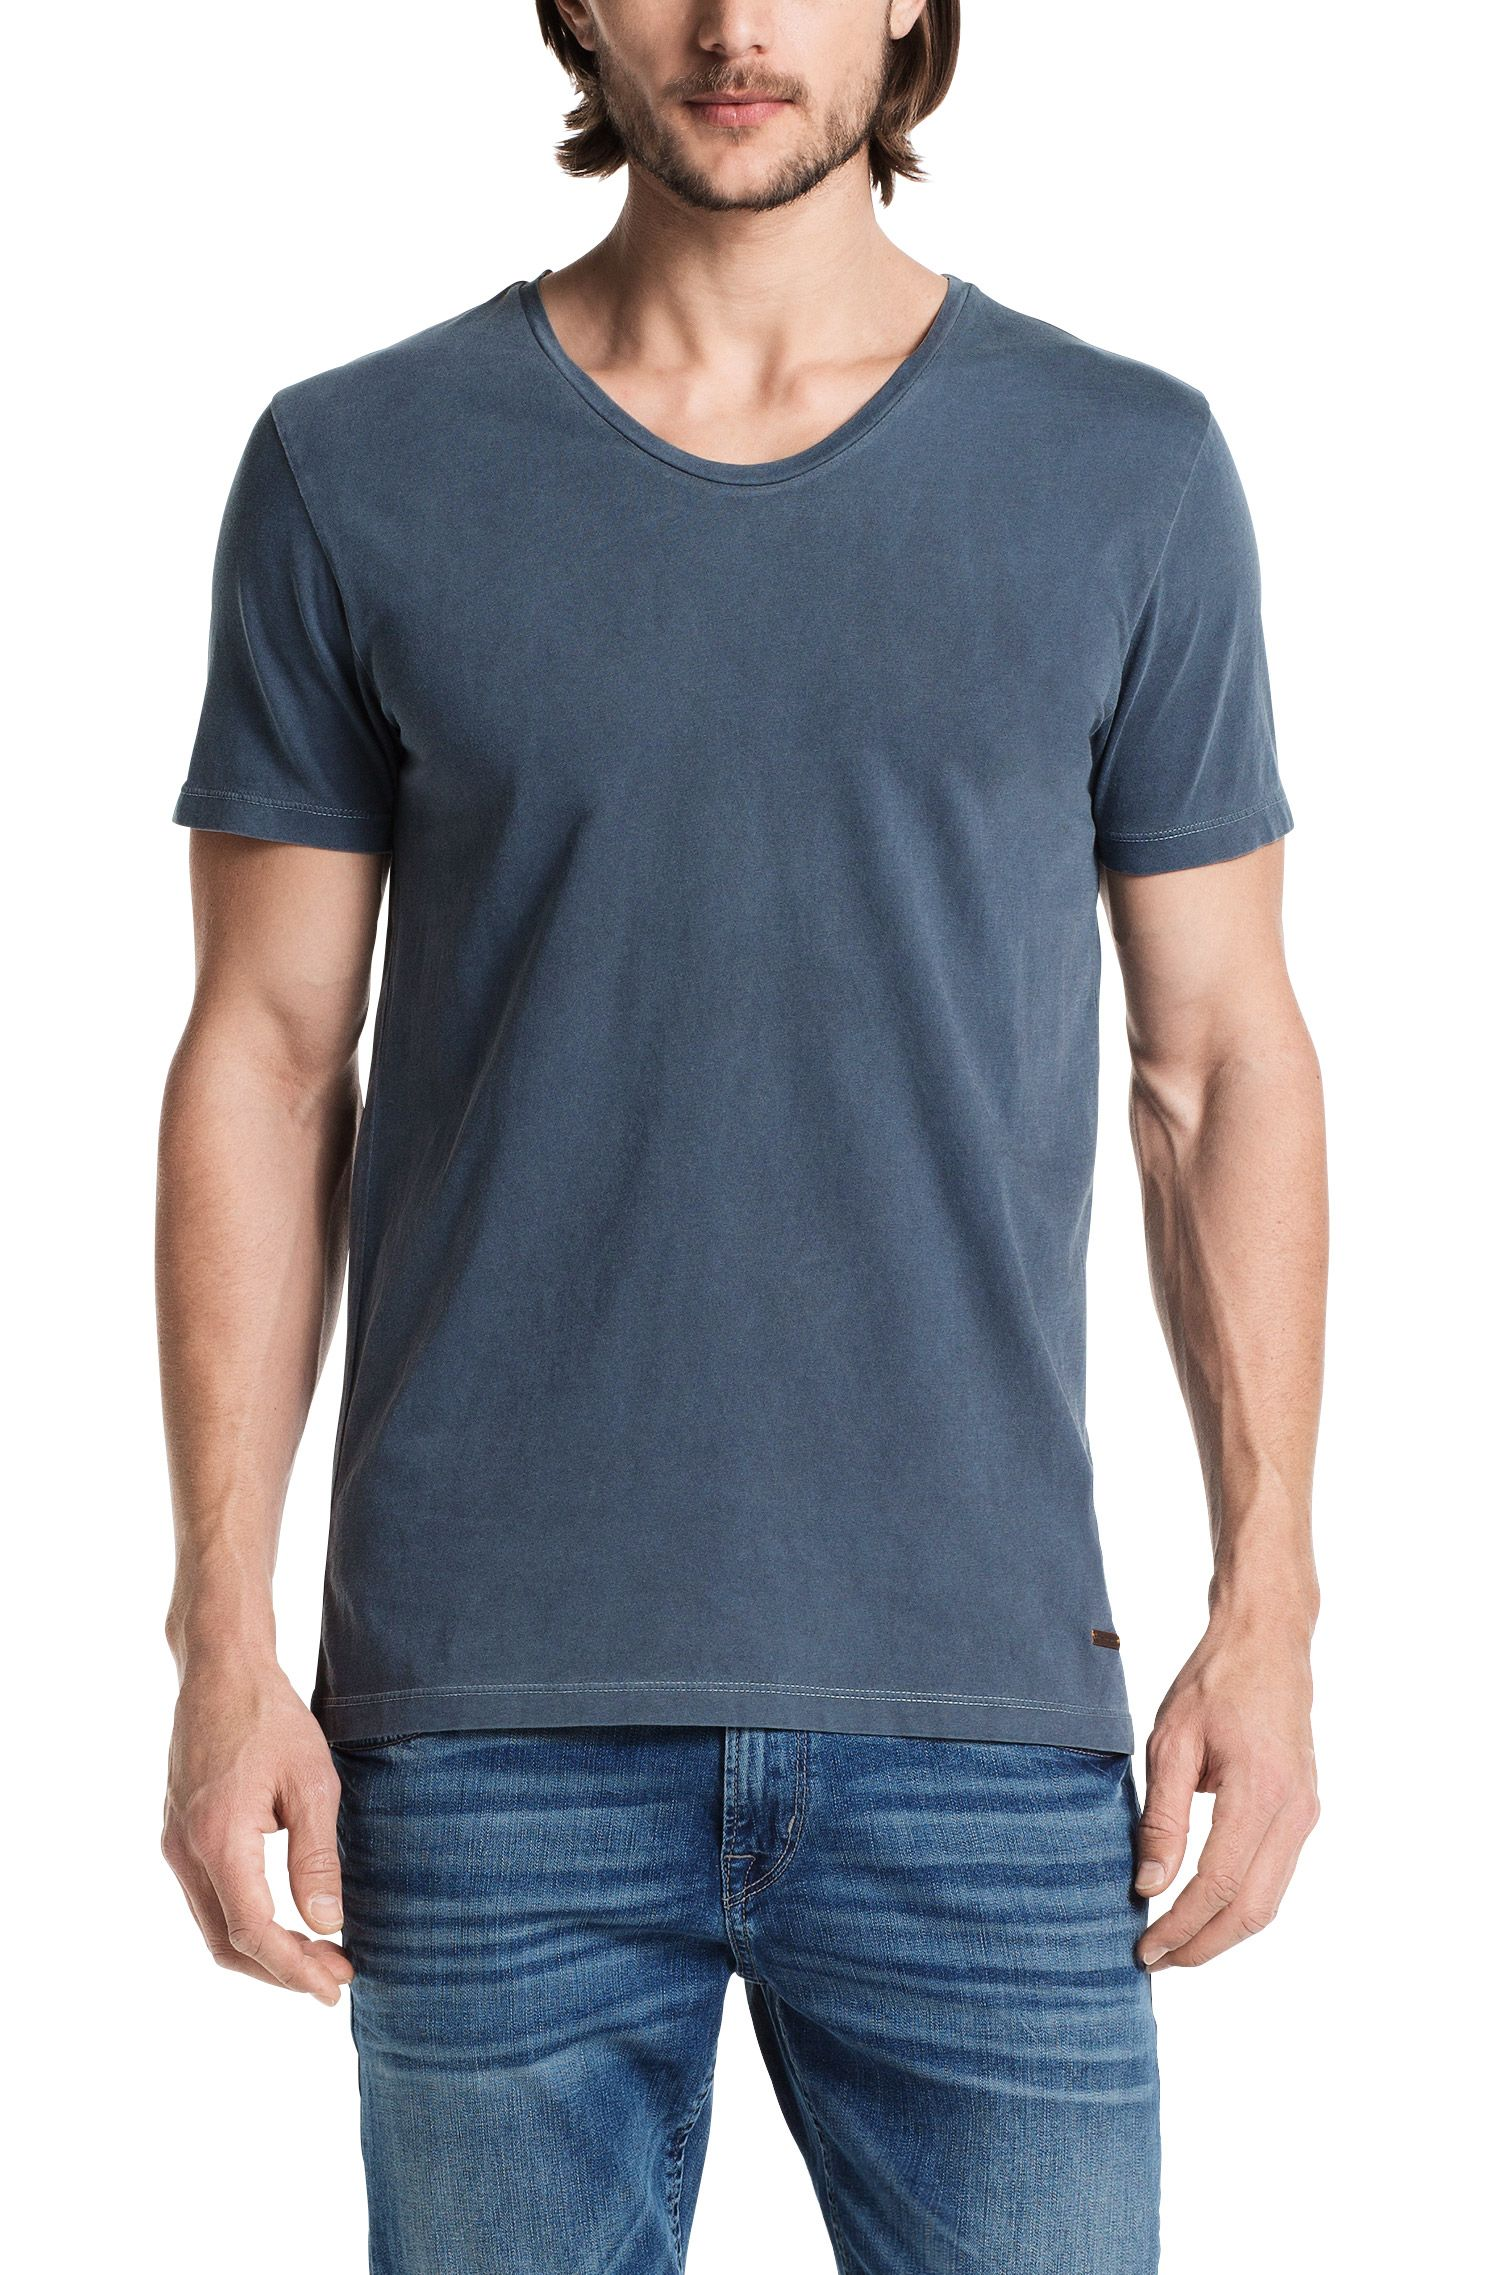 T-Shirt ´Taxer` mit Rundhals-Ausschnitt